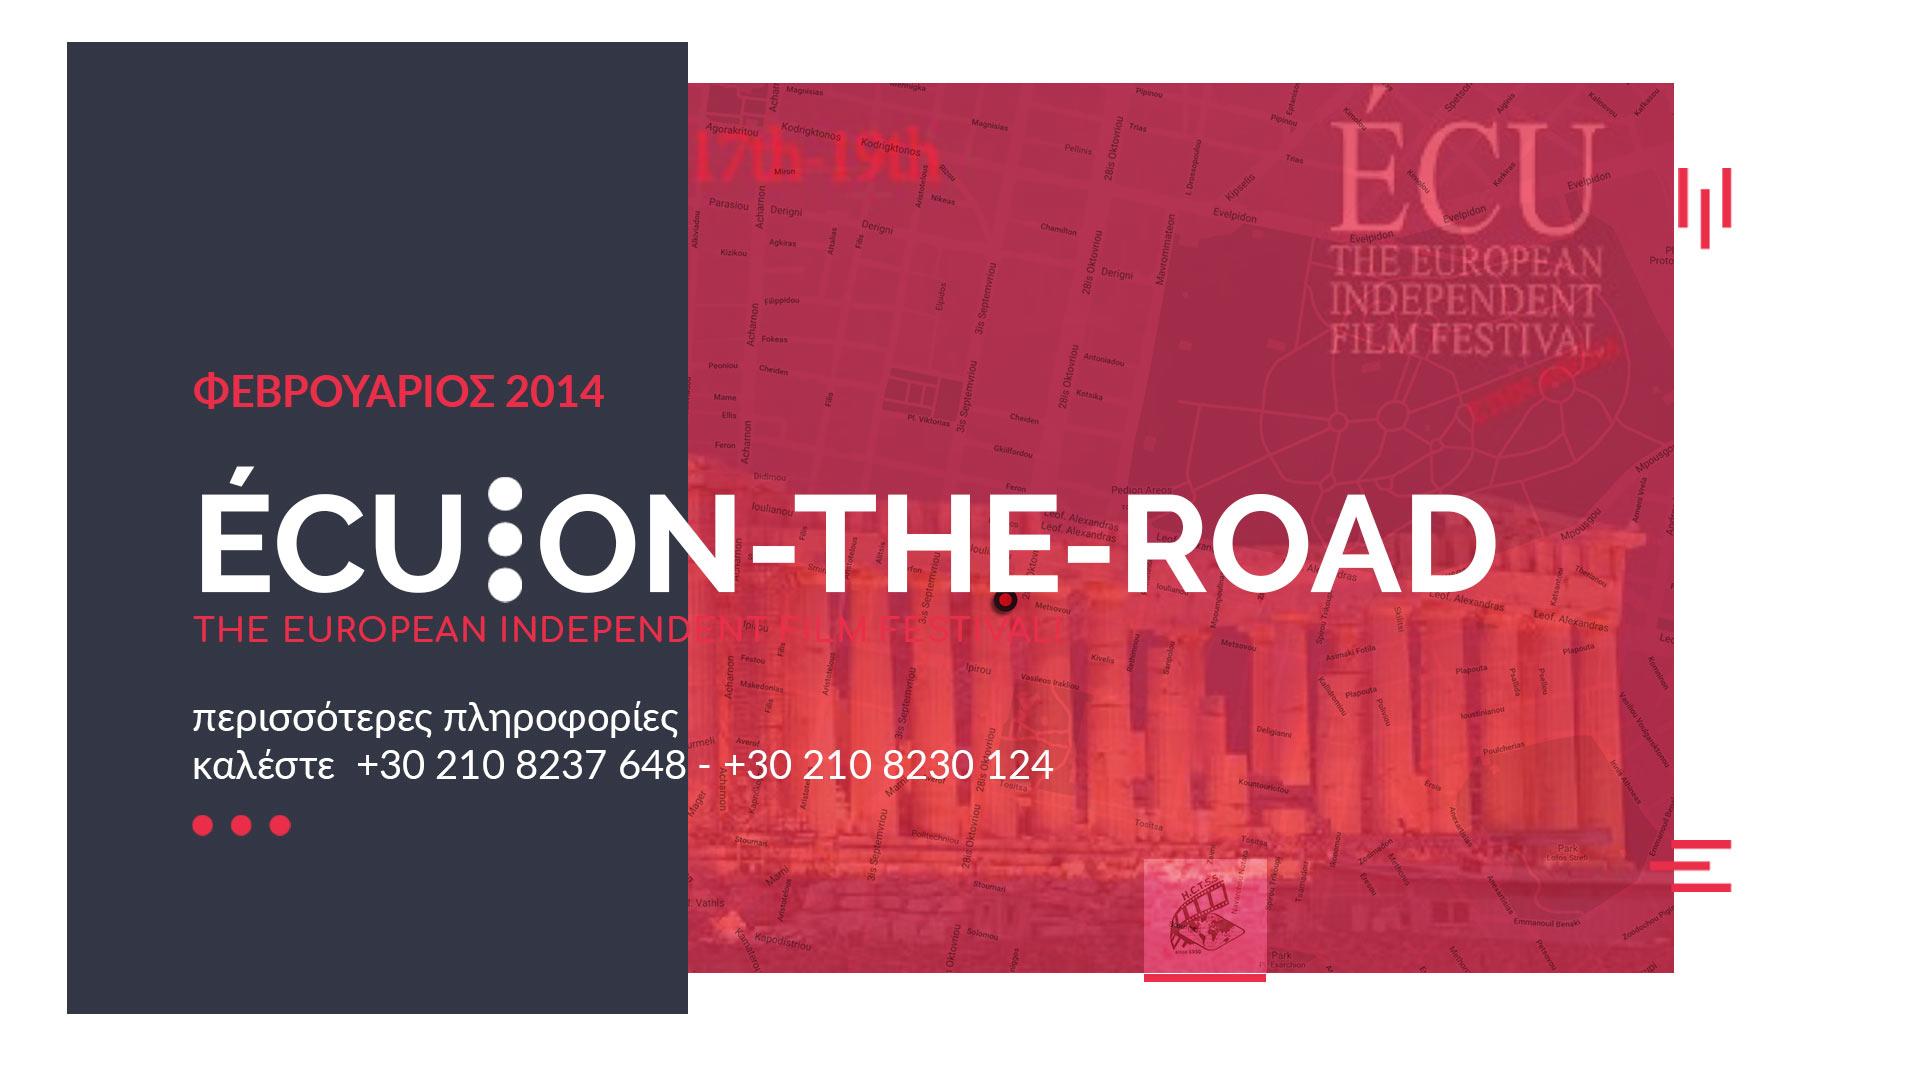 The European Independent Film Festival!